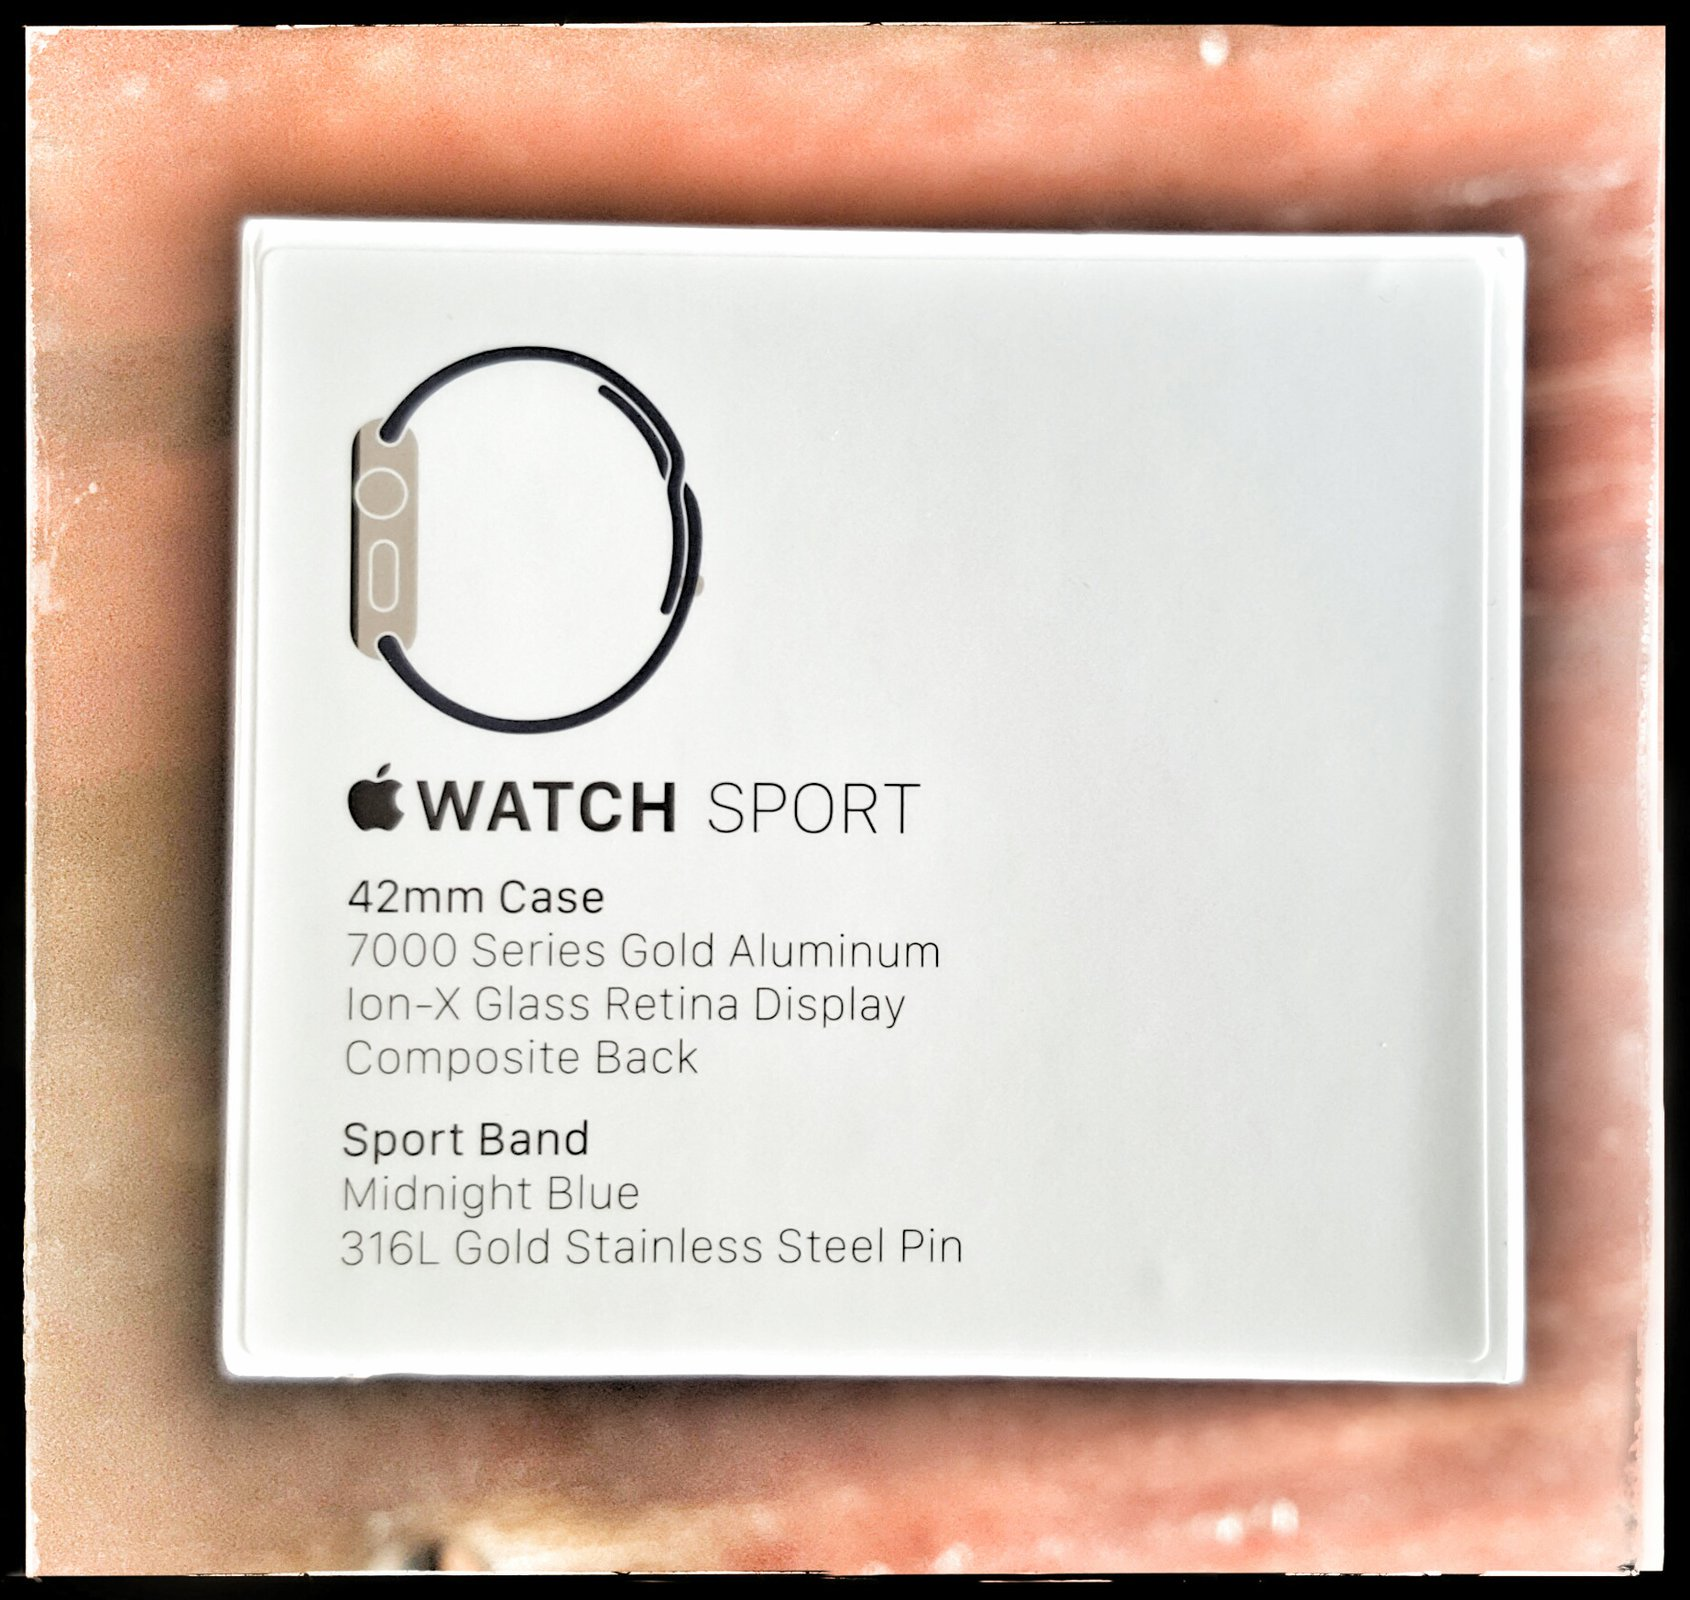 erledigt apple watch sport 42 mm gold mitternachtsblau neu uhrforum. Black Bedroom Furniture Sets. Home Design Ideas